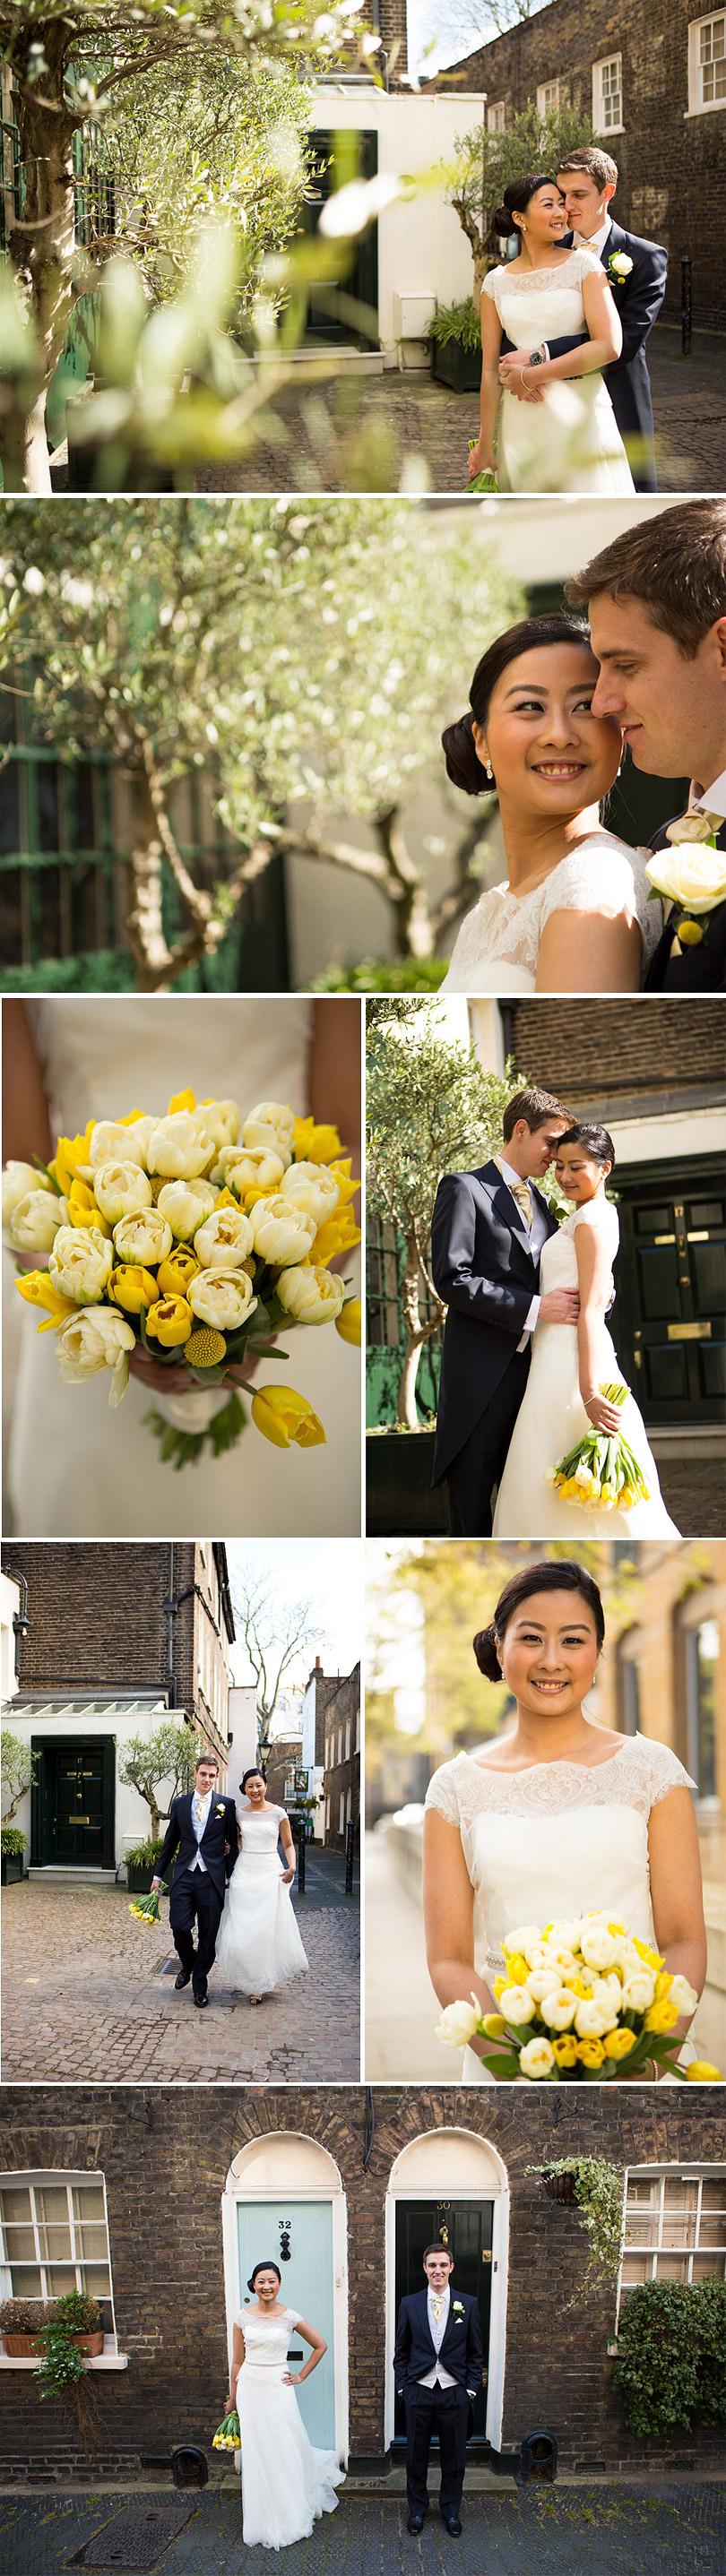 Daphne&Alex_The-Berkeley-Wedding-12.jpg